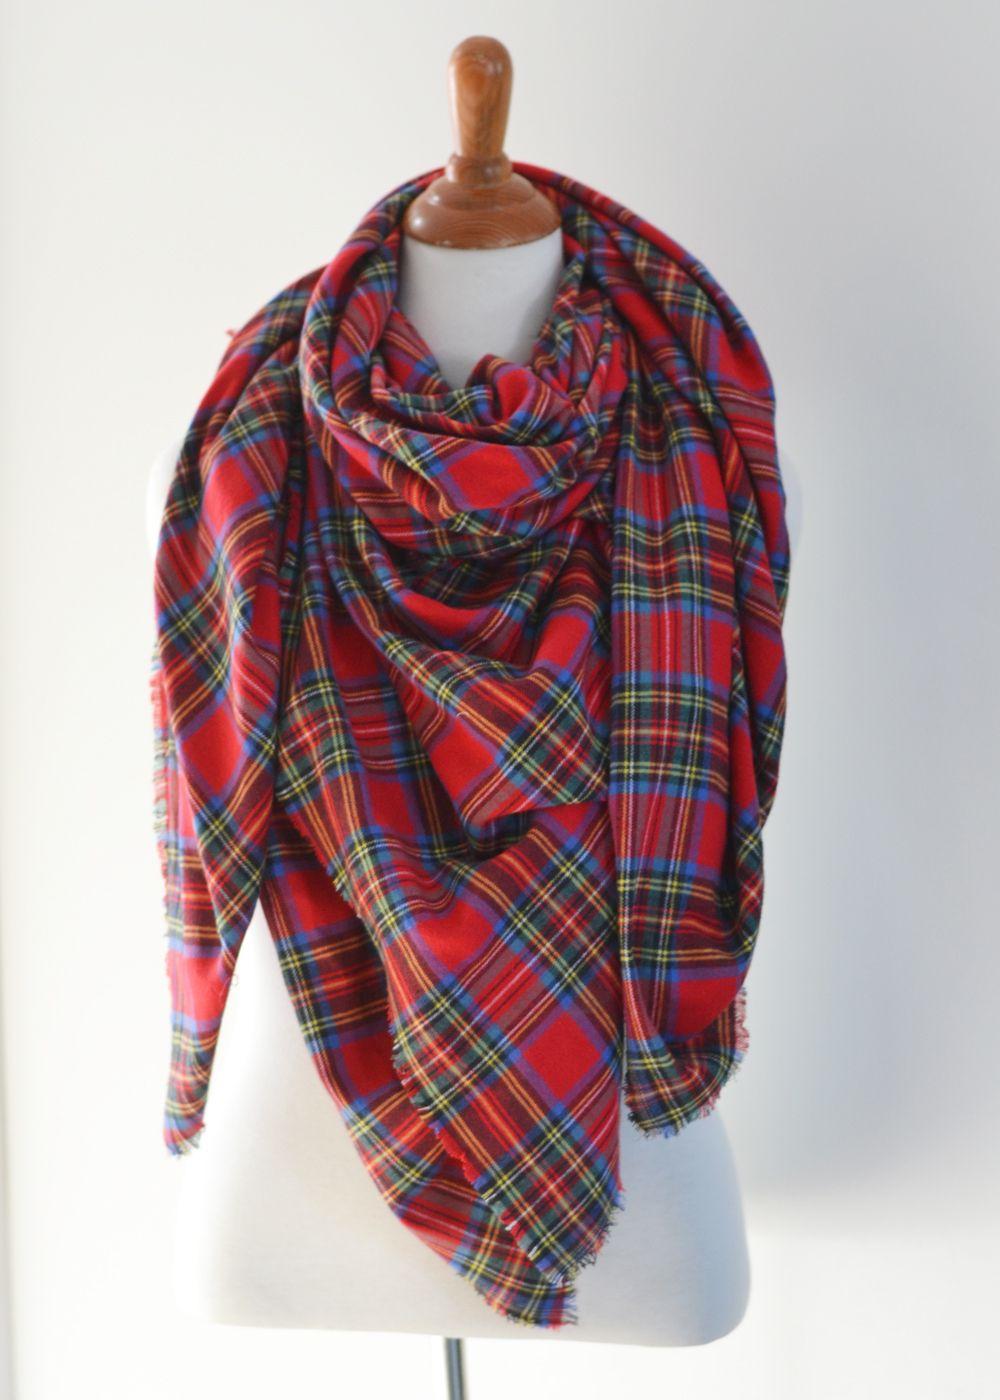 How to make a DIY plaid tartan blanket scarf - SO easy! | Crafts ...